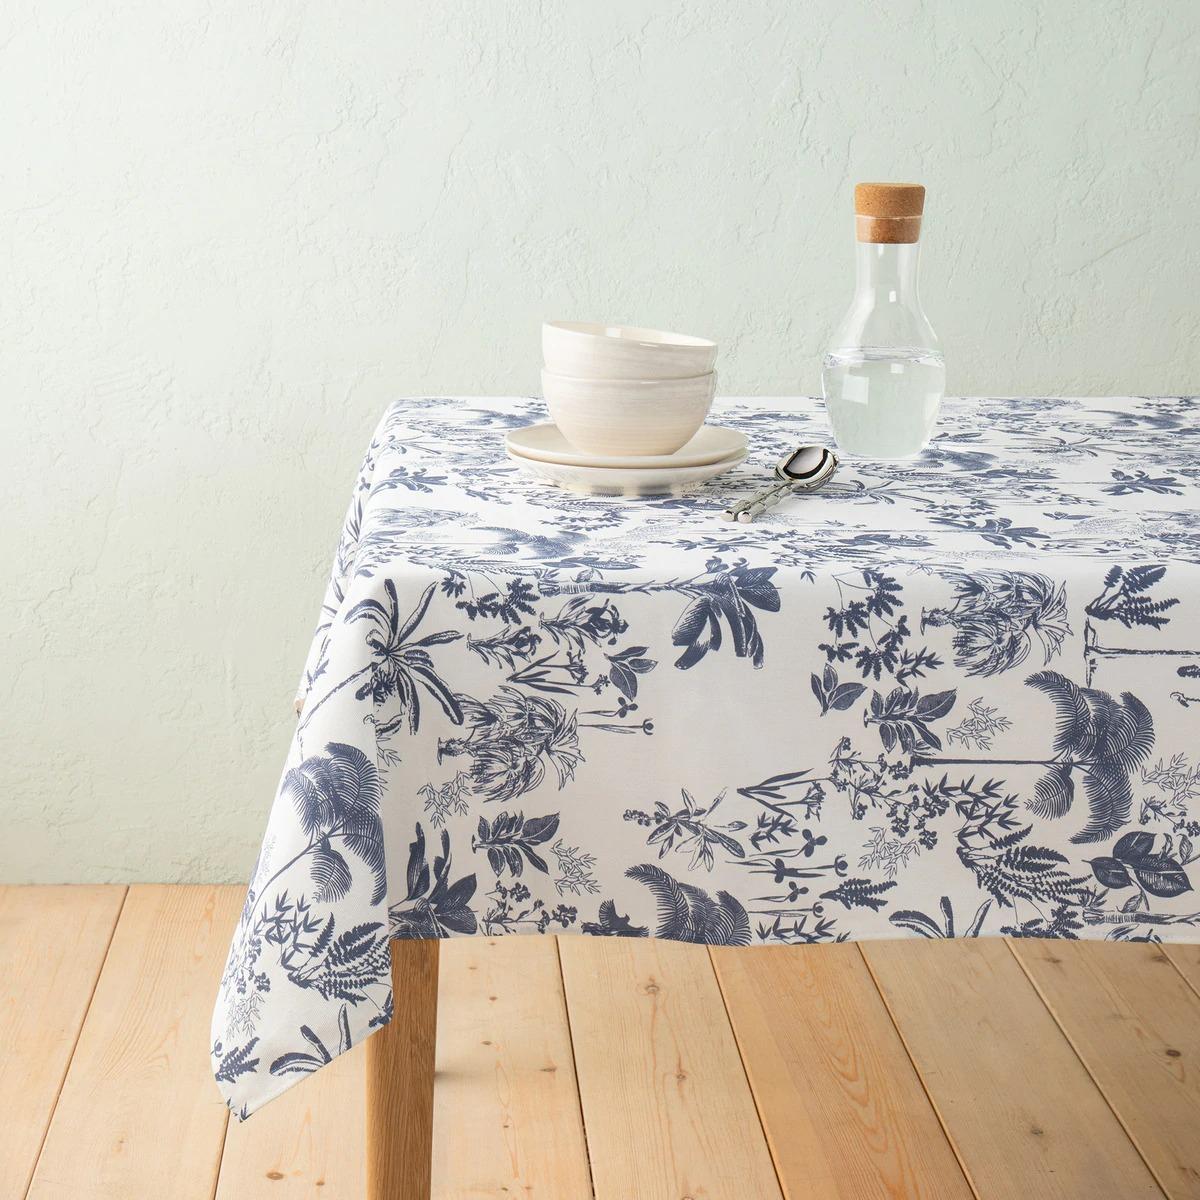 Stain resistant cotton tablecloth Paraíso El Corte Inglés